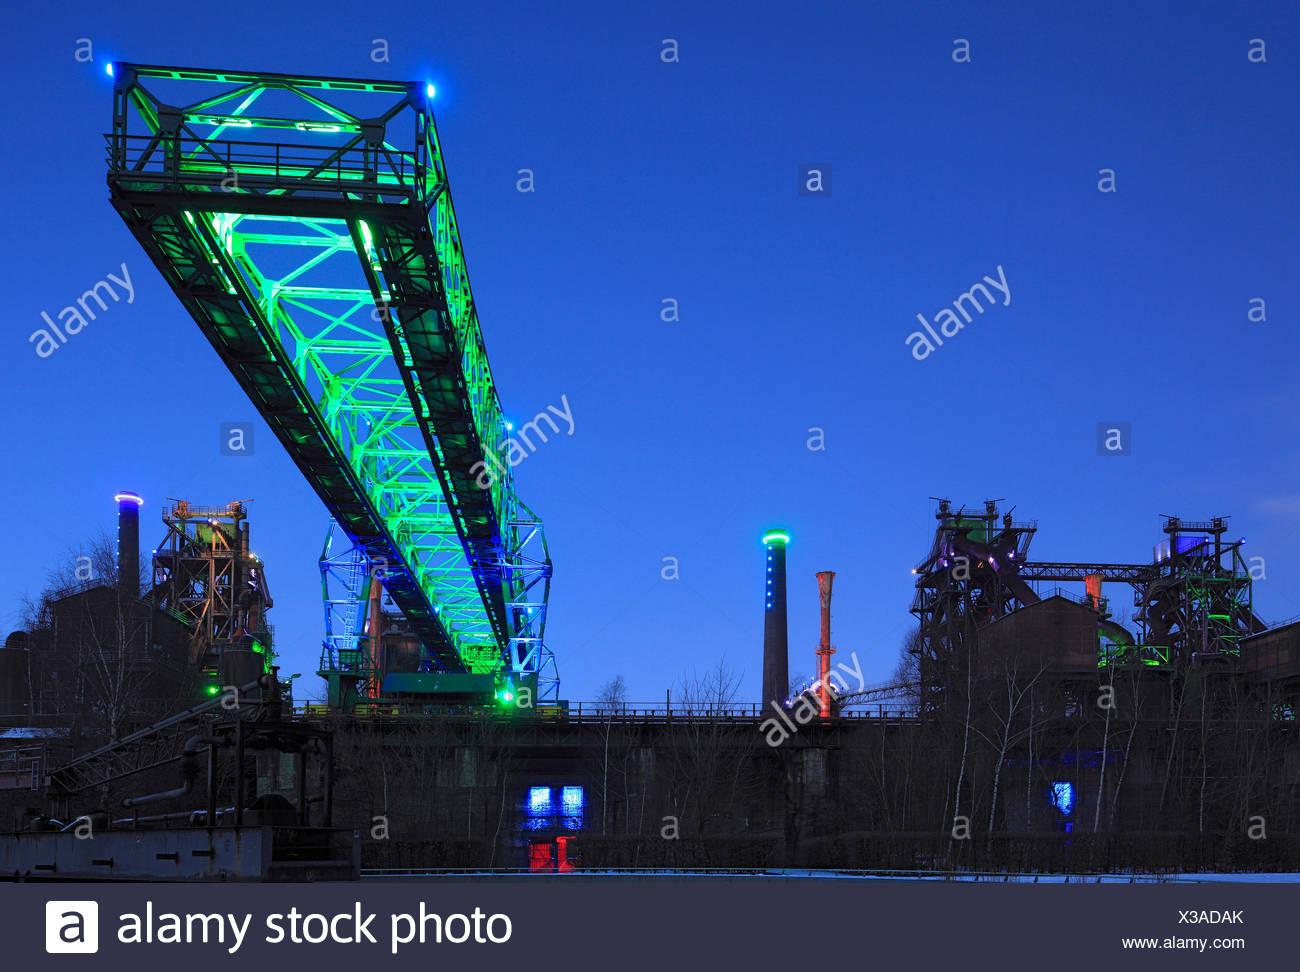 Germany, Europe, North Rhine-Westphalia, Duisburg, Meiderich, route of industrial culture, Emscherpark, lights, illumination, Jo - Stock Image